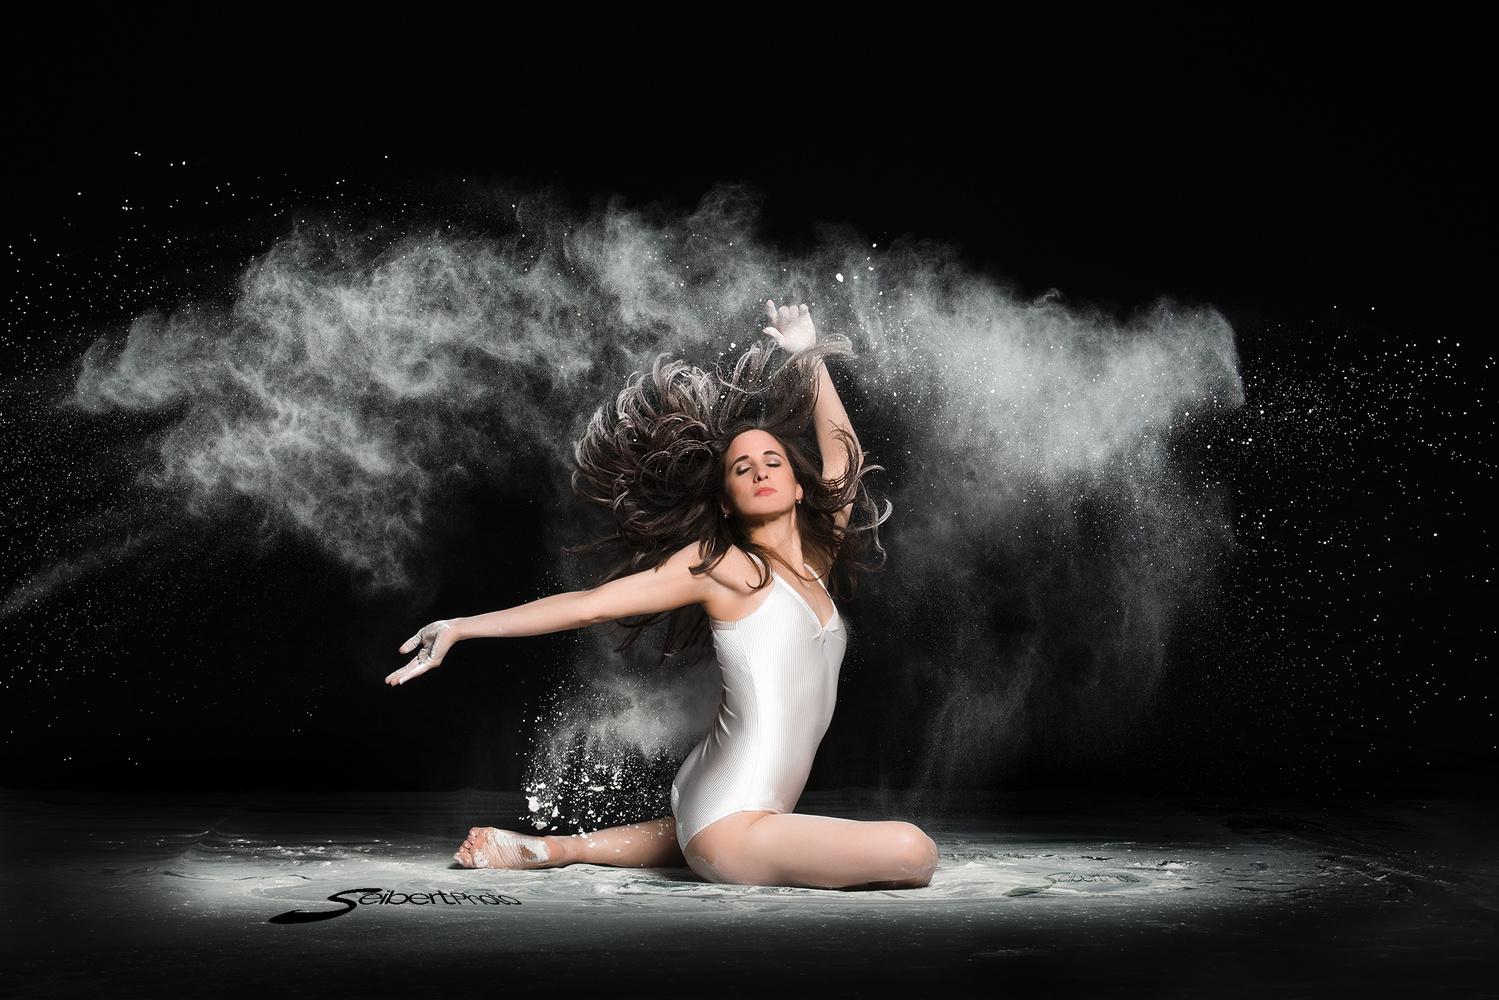 Ballerina Nathaly  by Tom Seibert